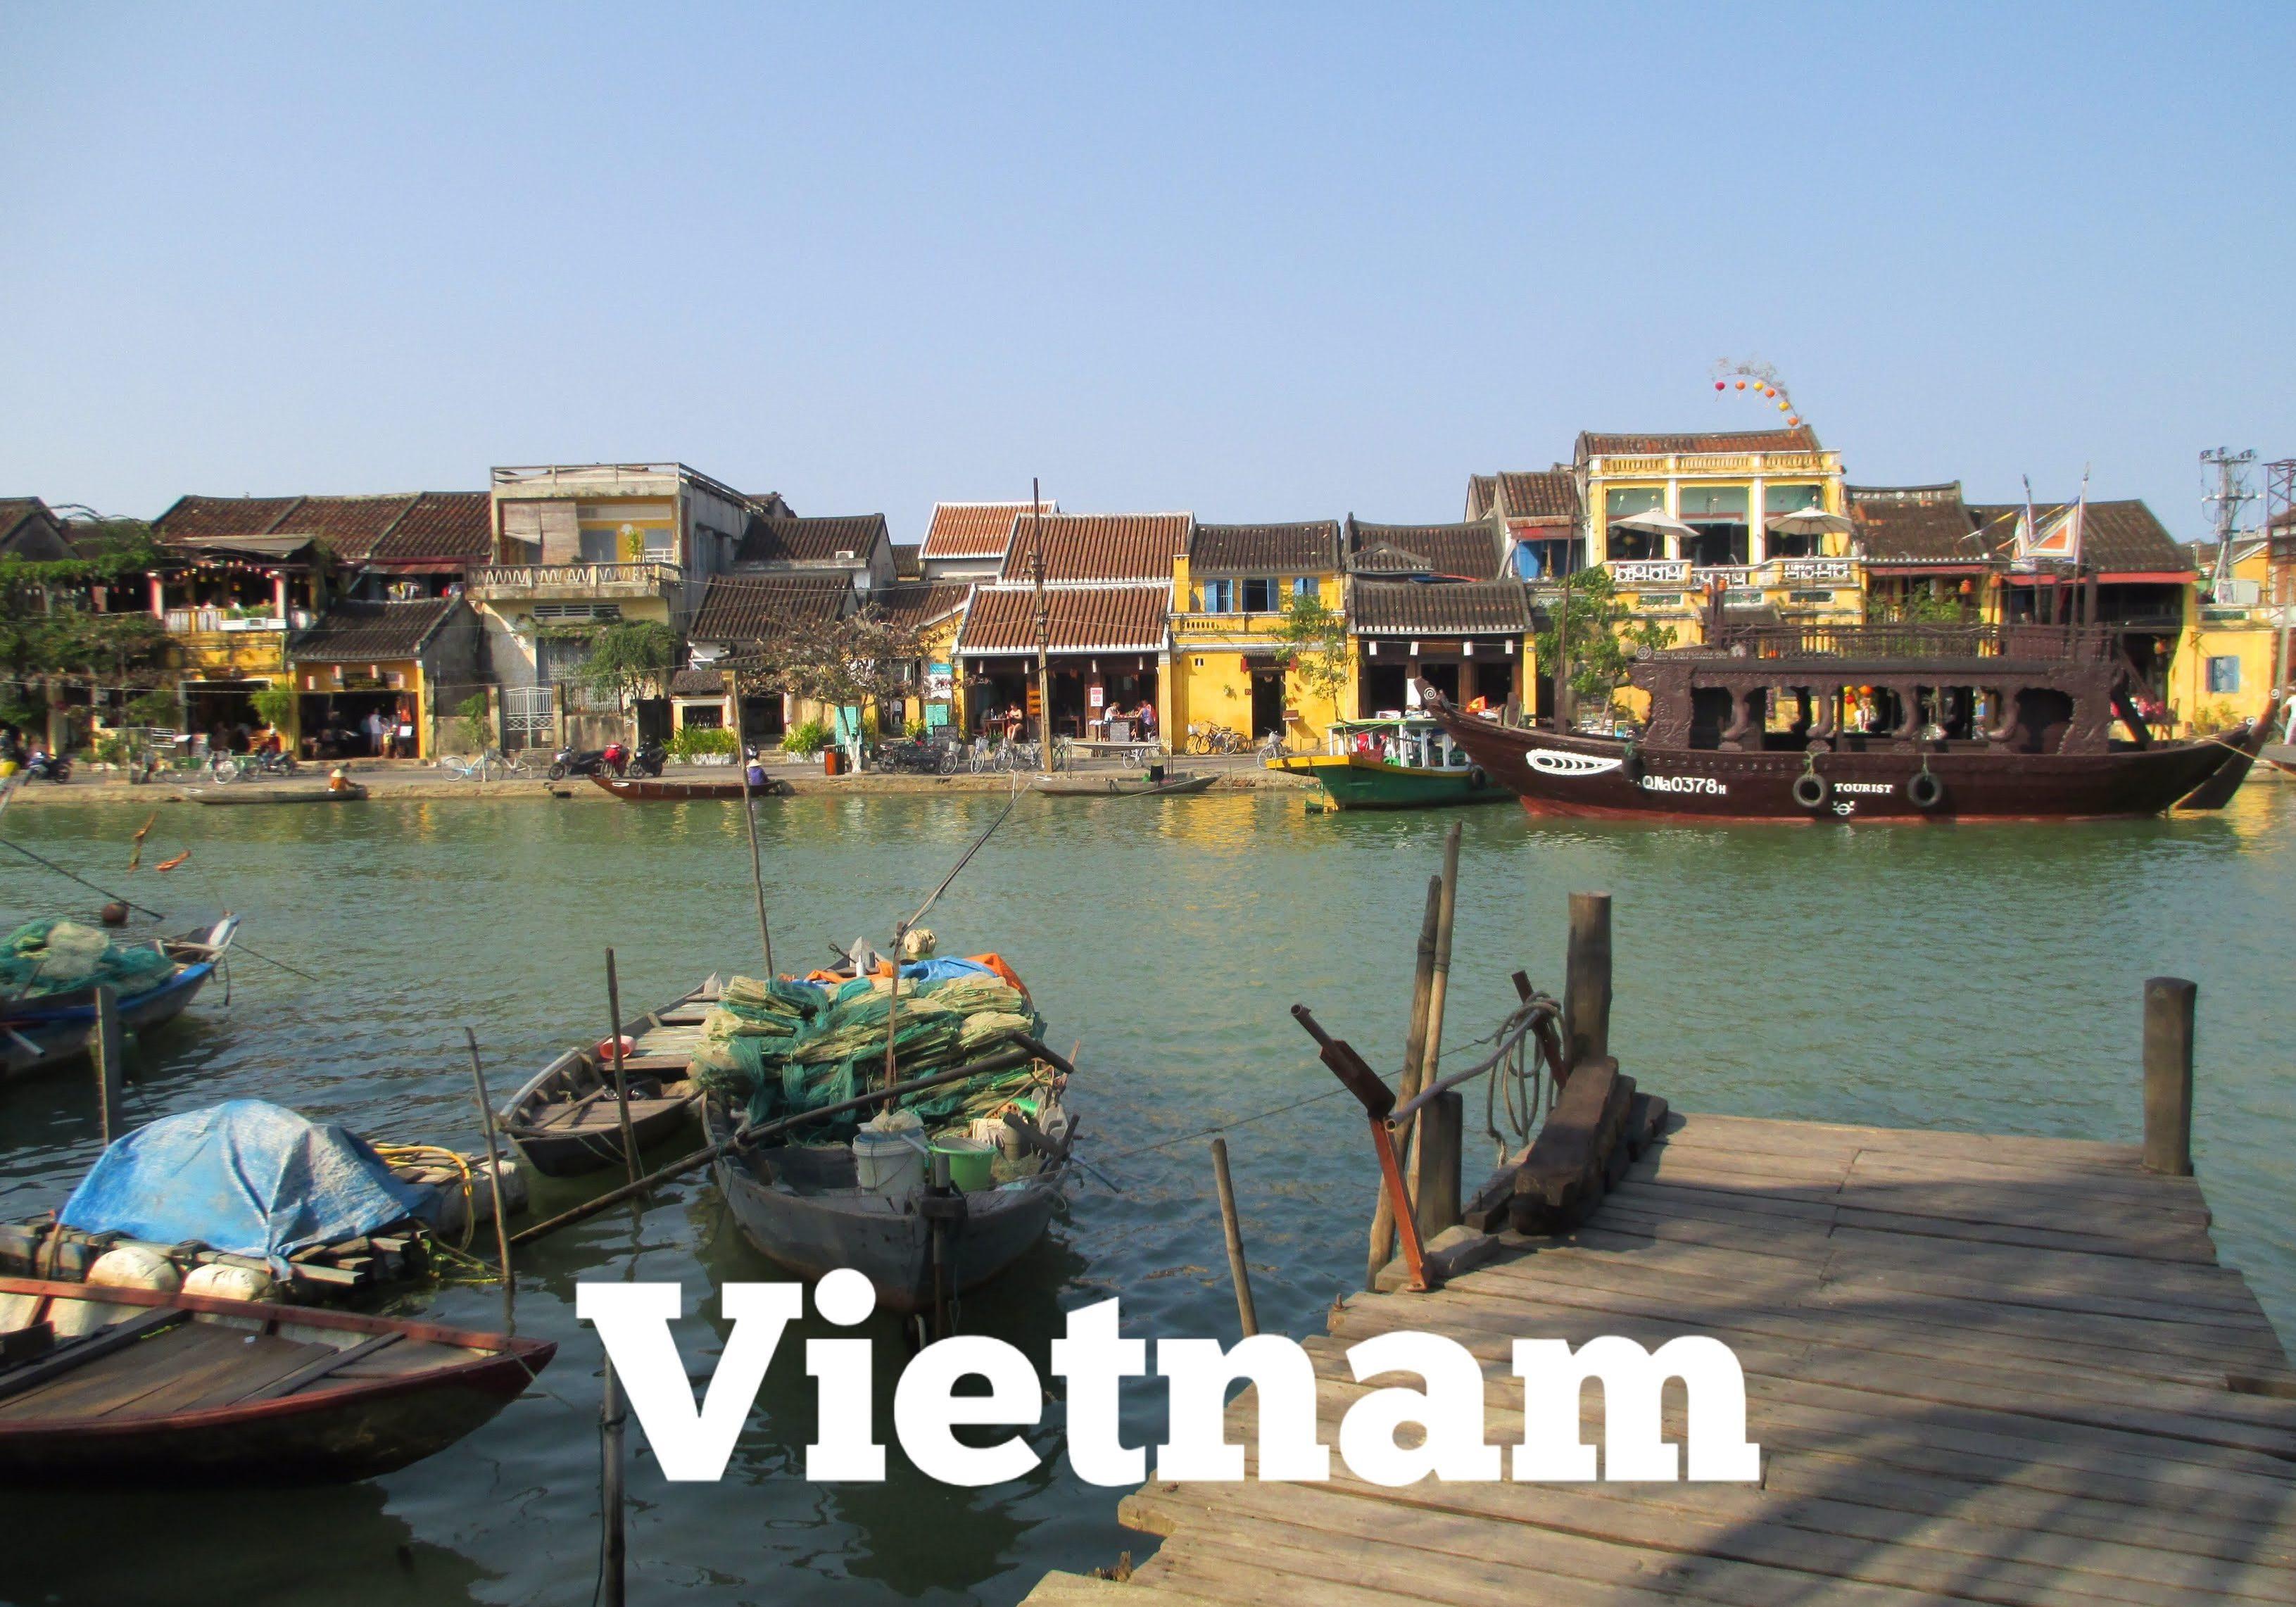 Vietnam, wanderdaze, blog, travelling, travel blog,